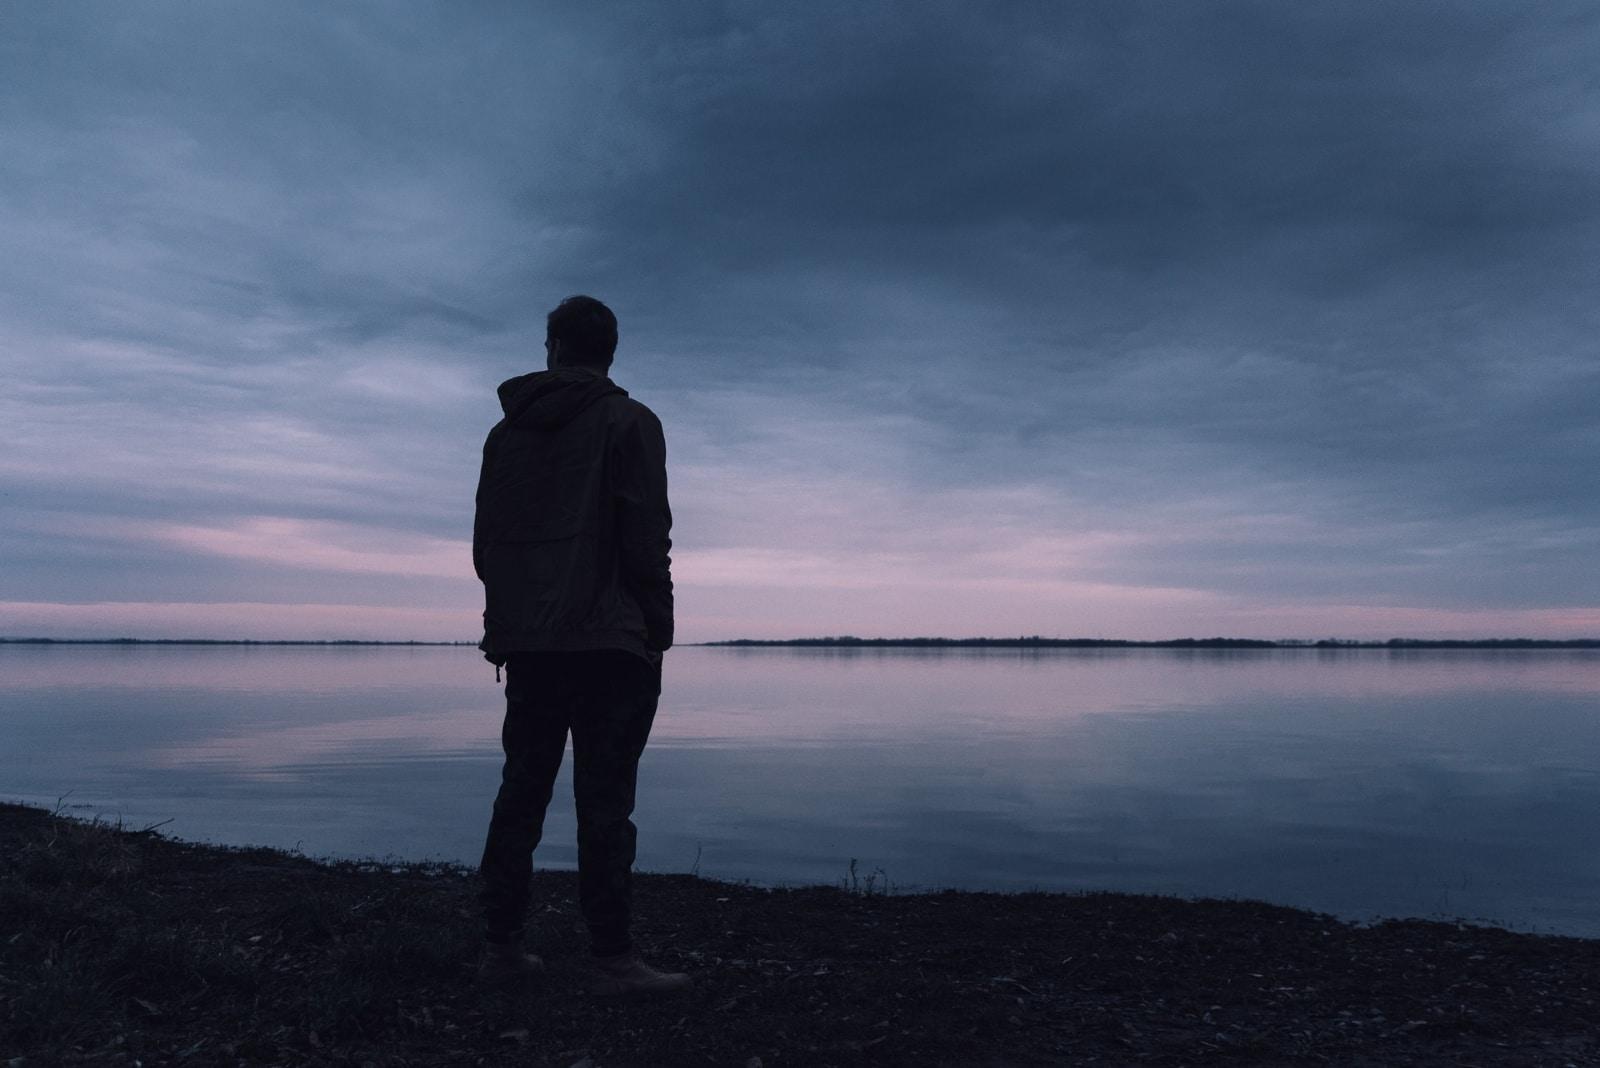 man in gray jacket standing near water